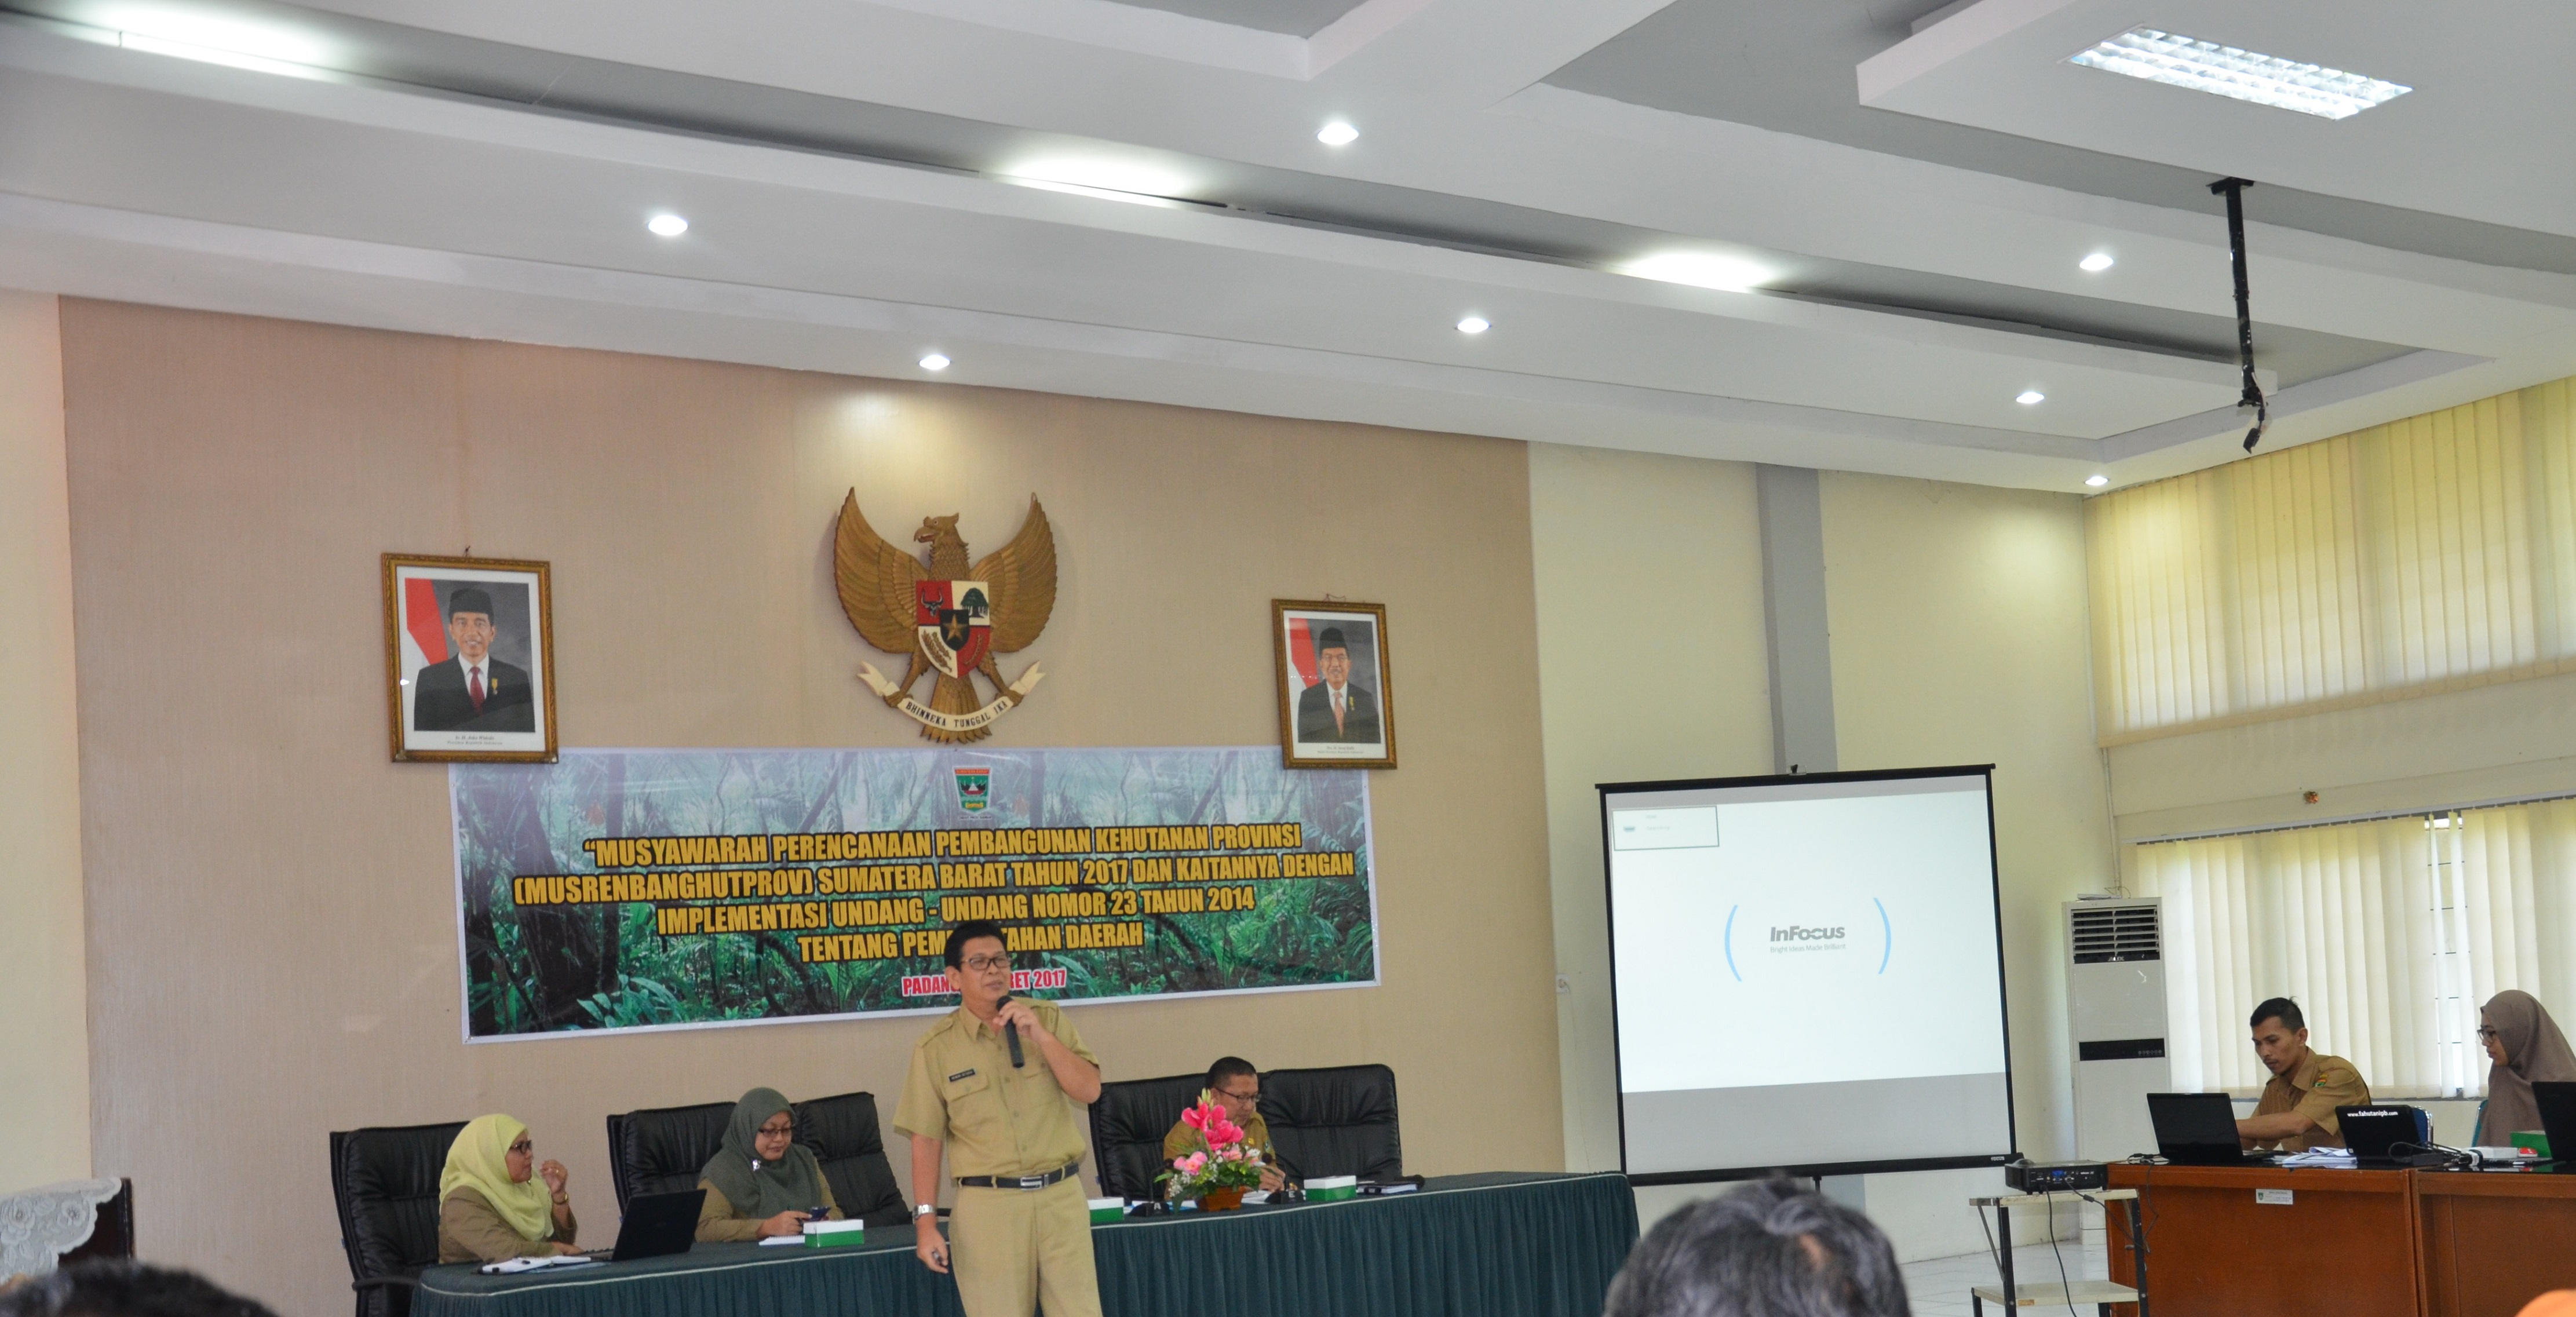 Musrenbanghutprov Dinas Kehutanan tahun 2017